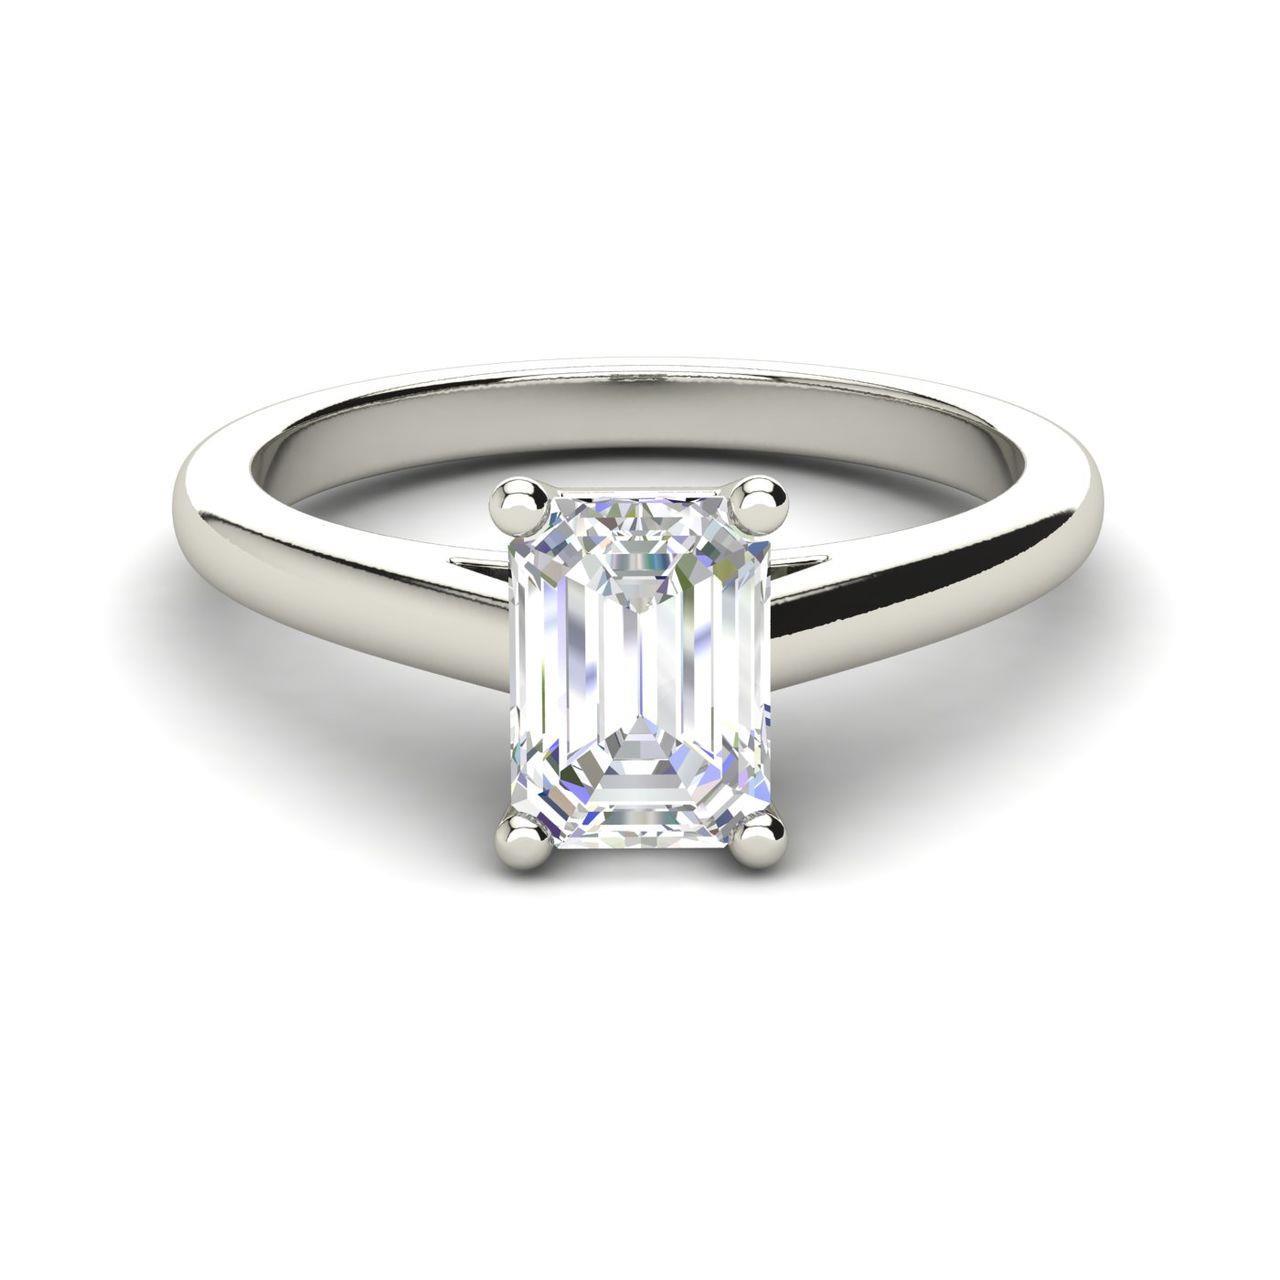 Solitaire 1 Carat Emerald Cut Diamond Engagement Ring